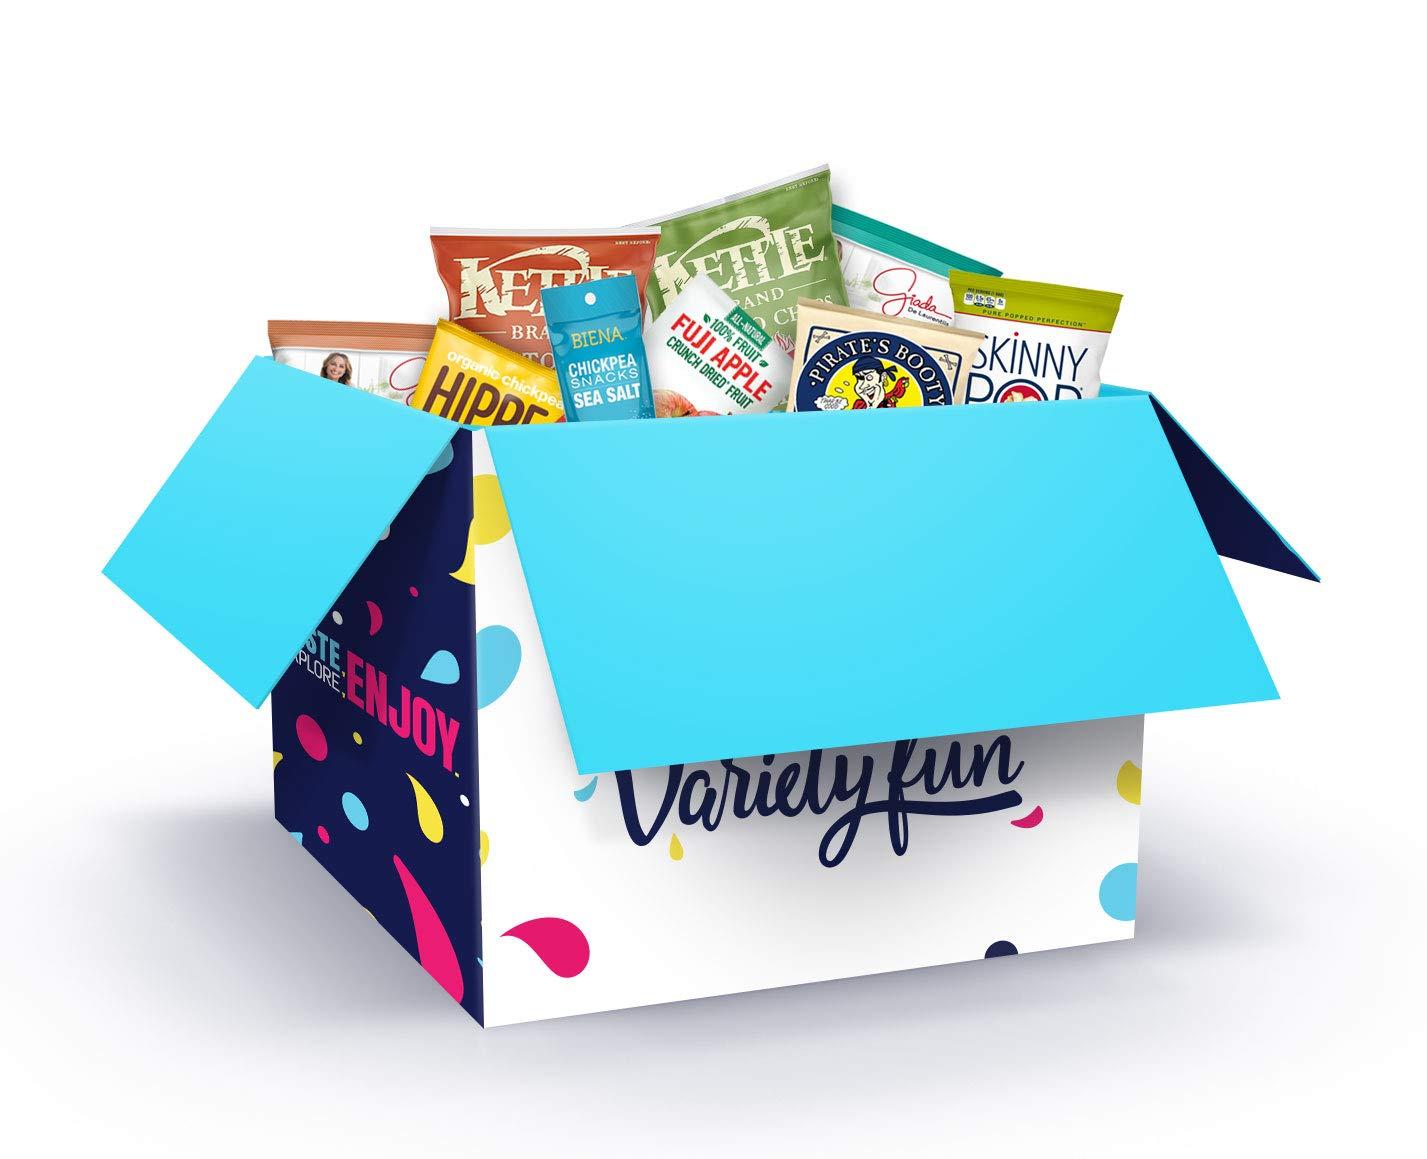 Ultimate Premium Healthy Chips & Snacks Care Package Variety Pack by Variety Fun (Office Package 100 Count) by Custom Varietea (Image #1)